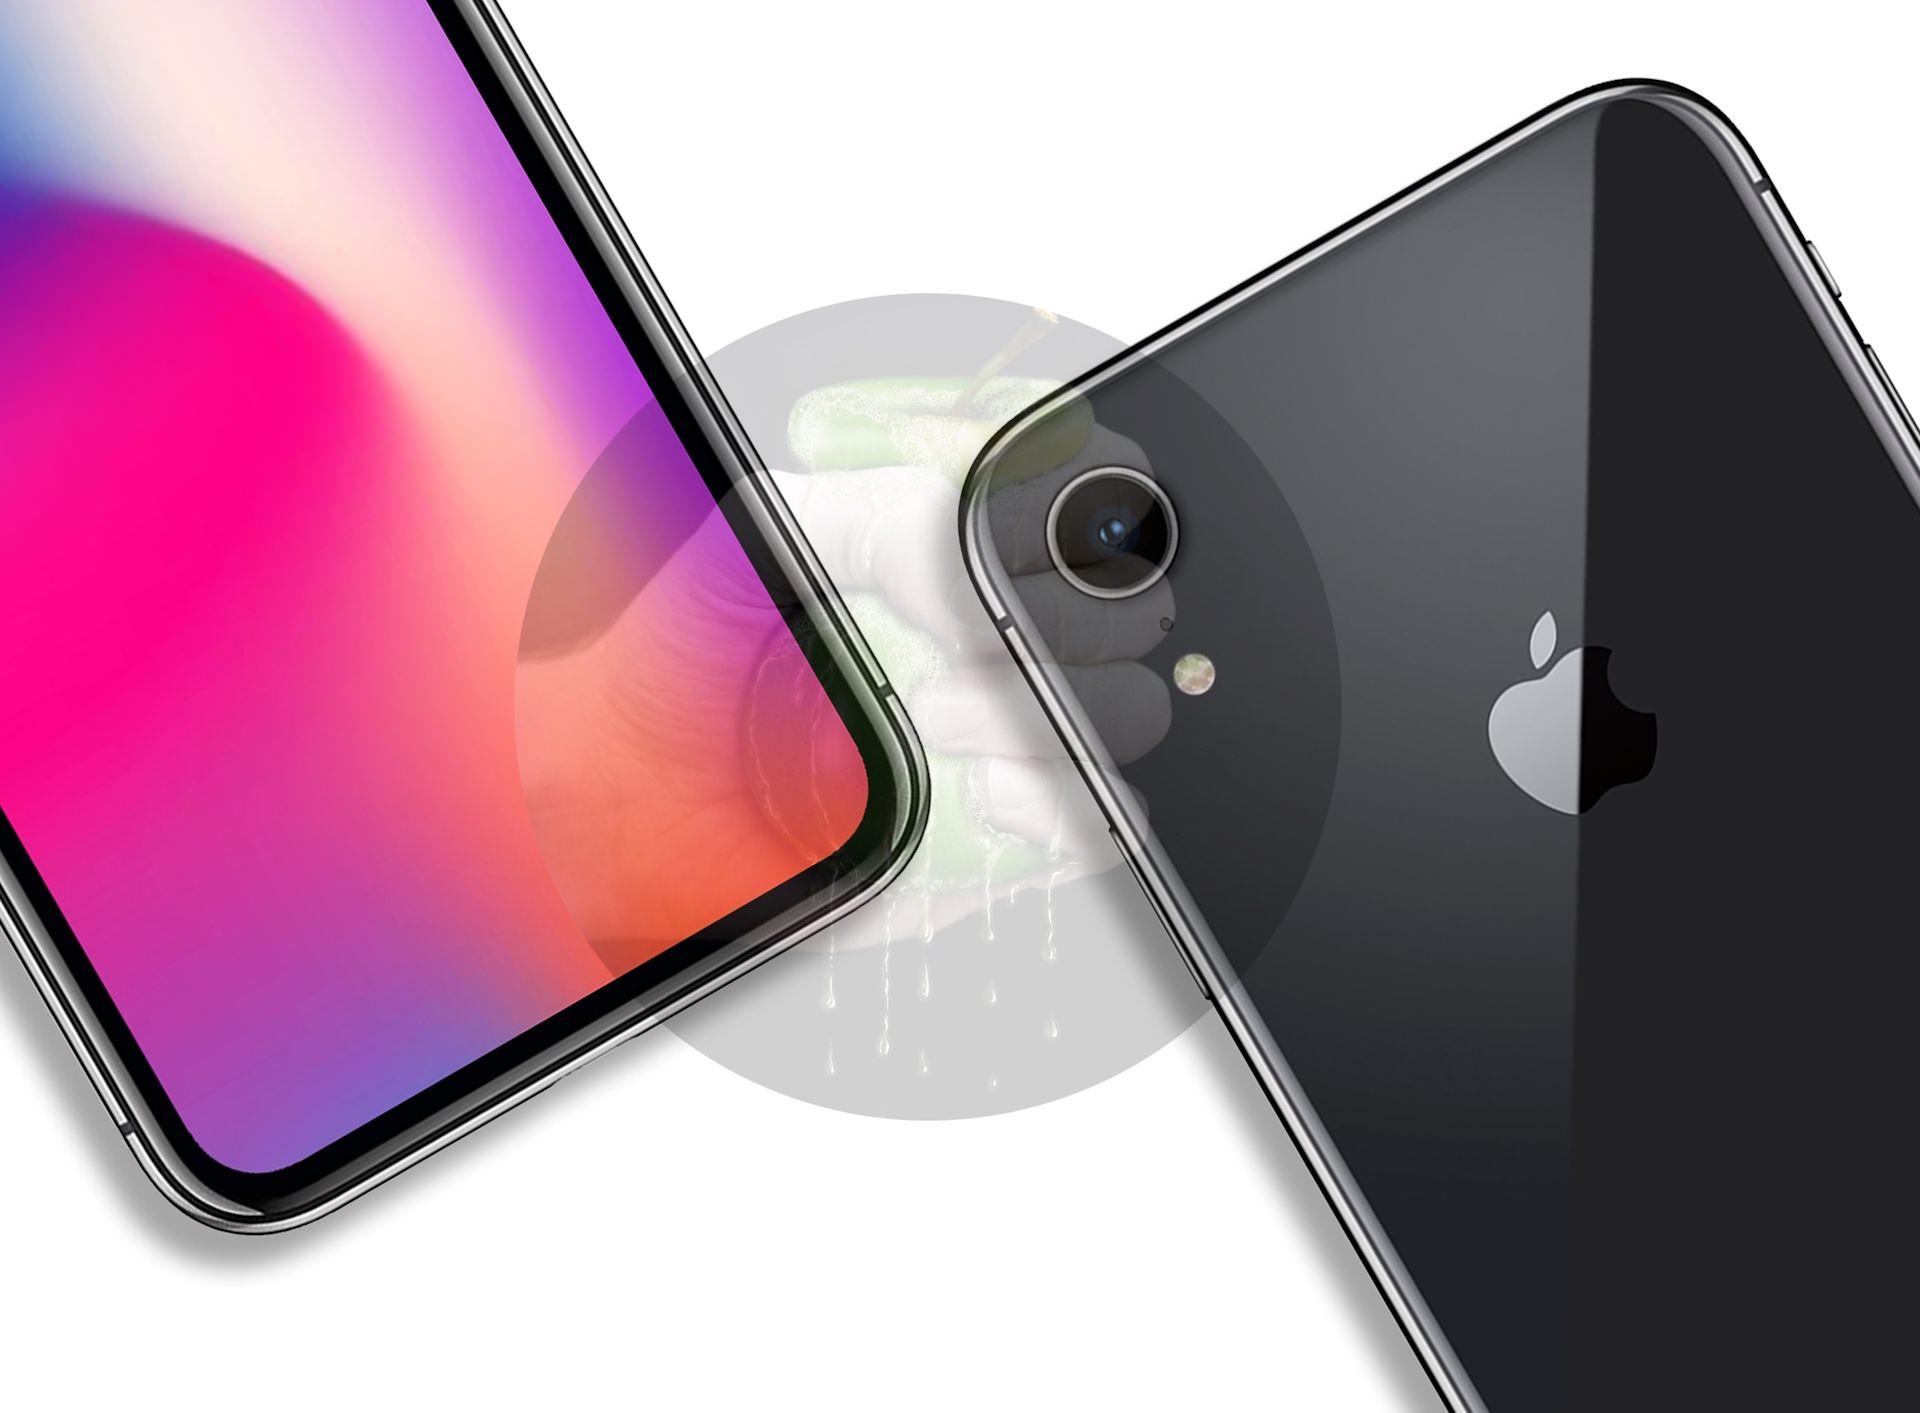 iPhone-9-wylsacom-7.jpg